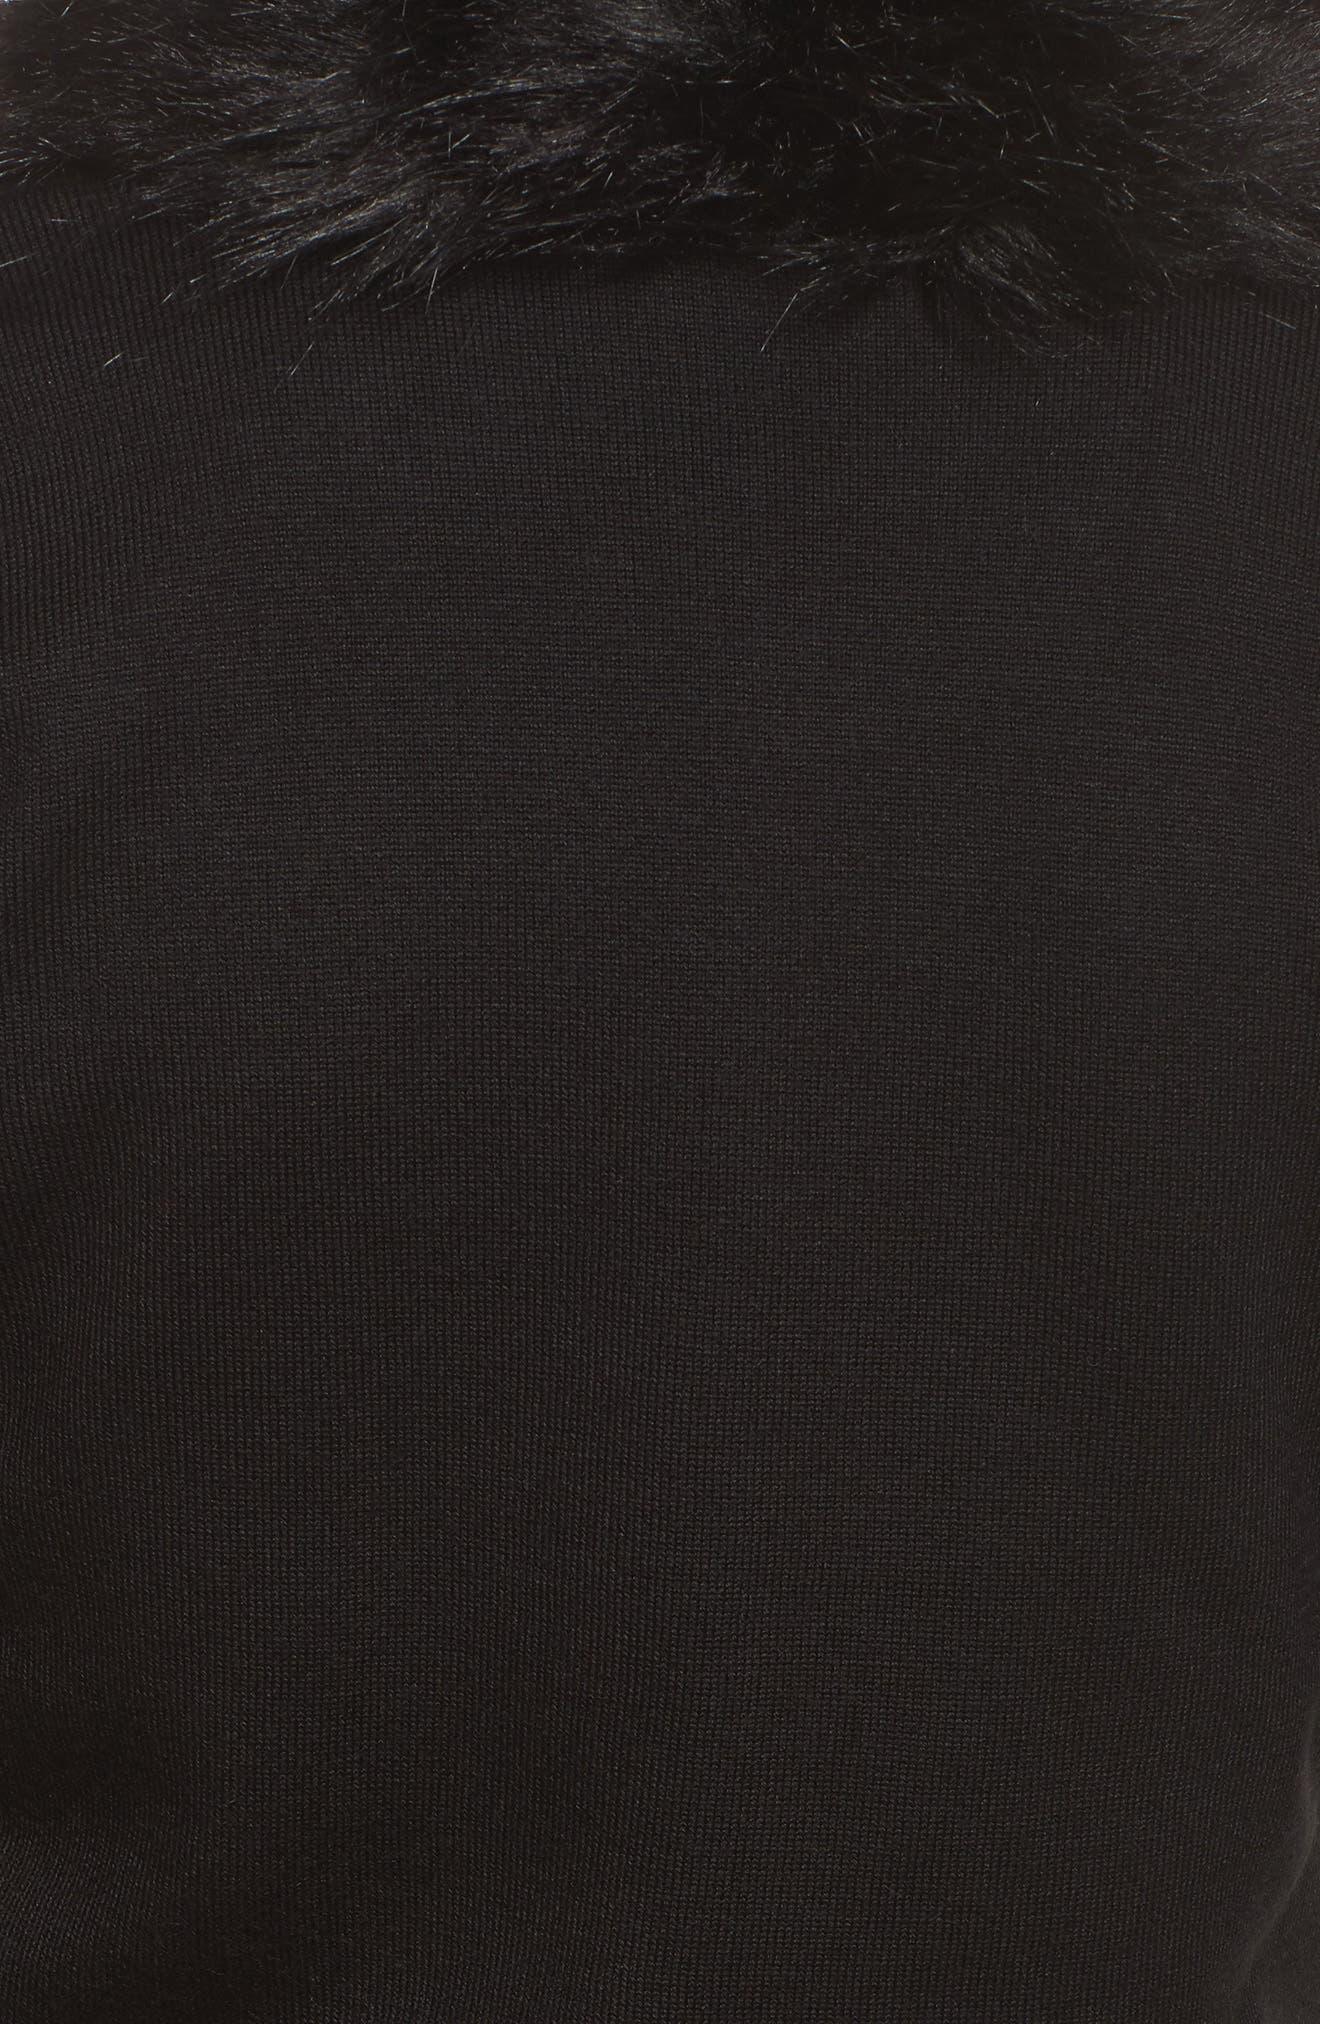 Faux Fur Trim Cardigan,                             Alternate thumbnail 5, color,                             Black